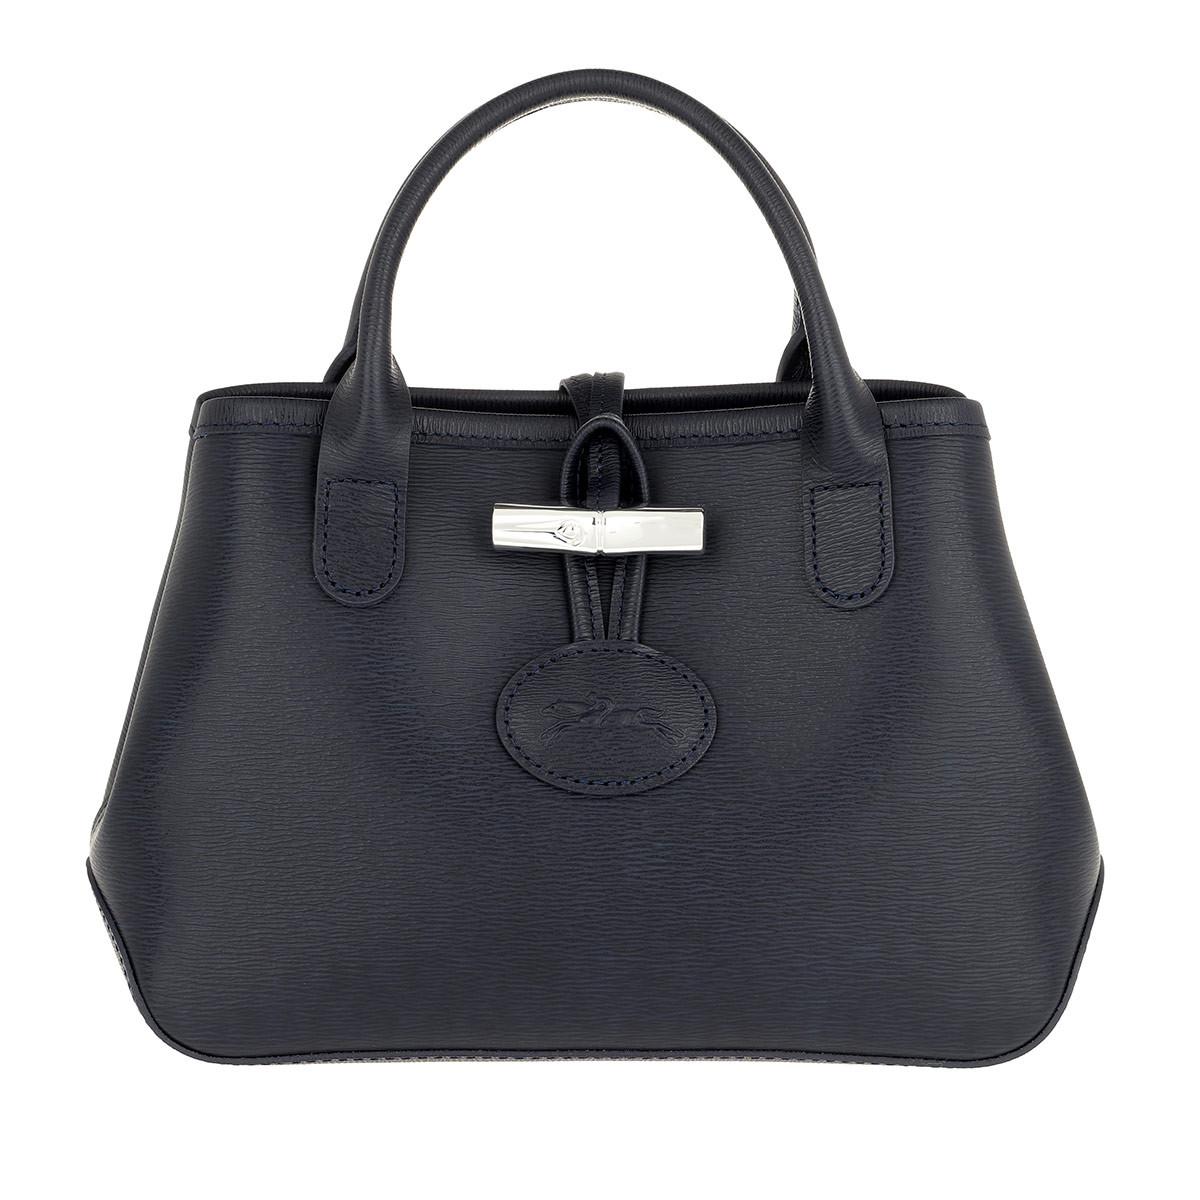 Longchamp Tote - Roseau Crossbody Bag Leather Navy - in blau - für Damen